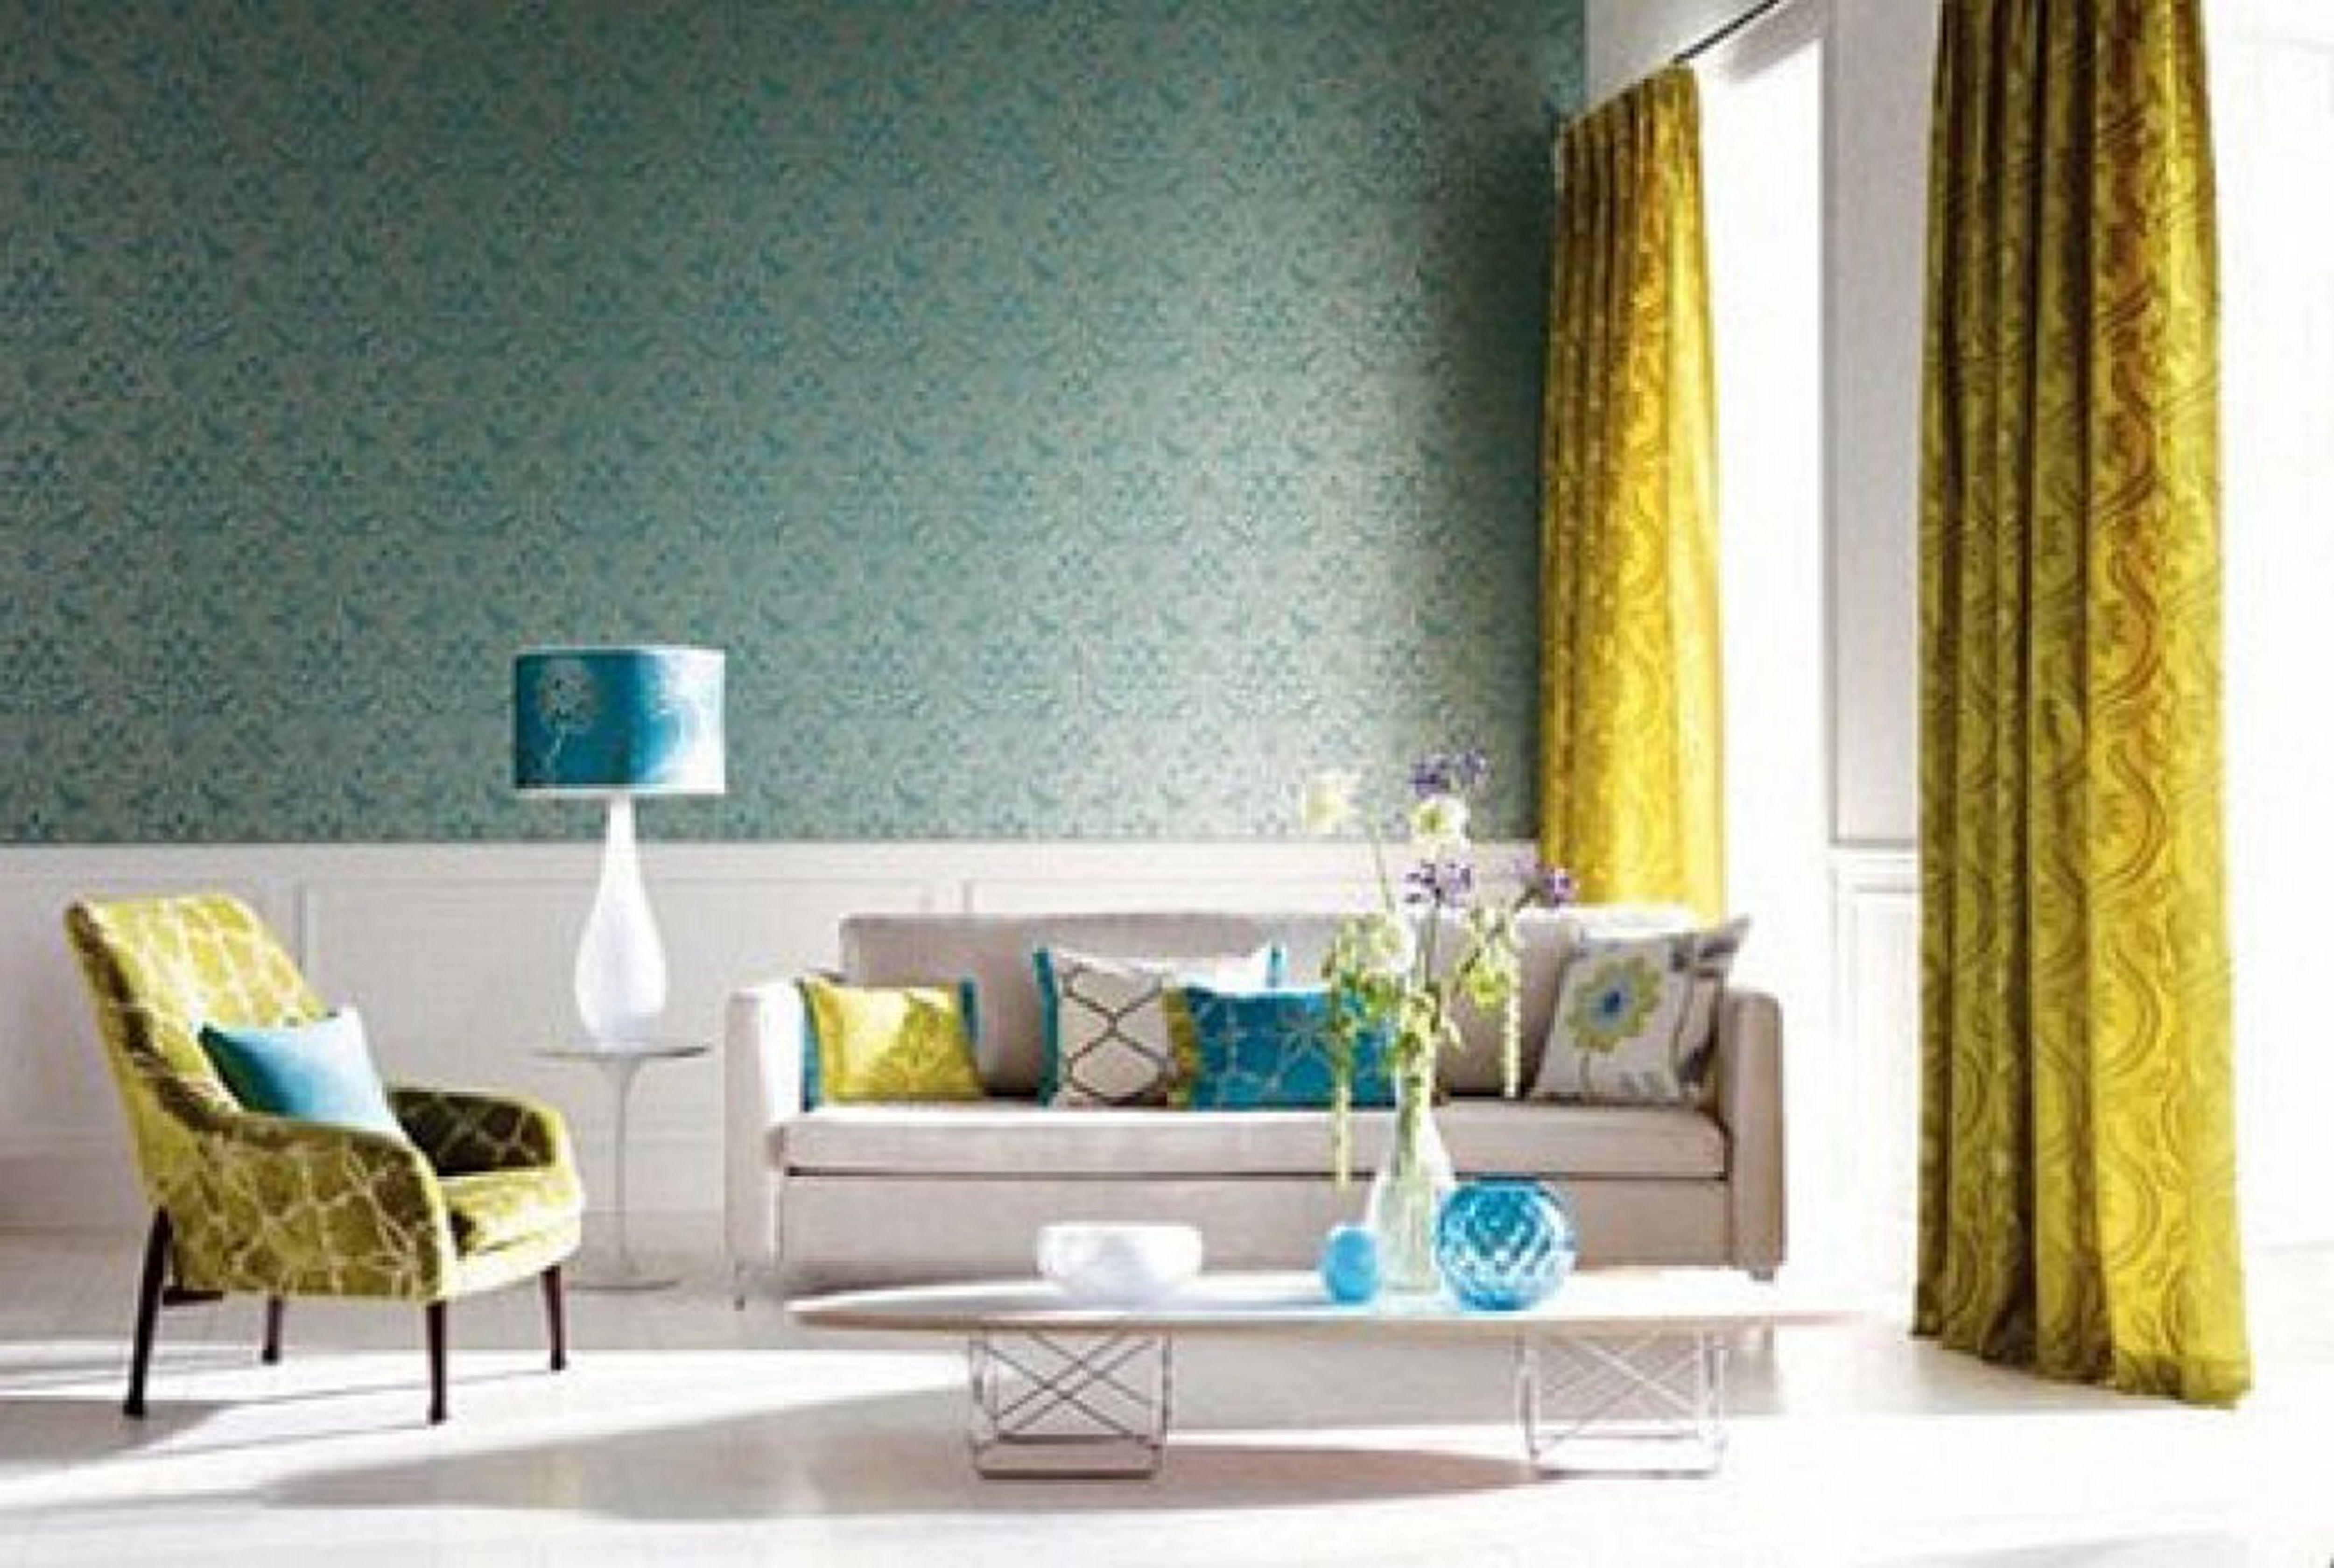 Home Decor Wallpaper Designs Trendy House Wallpaper Designs Photo. Wallpaper house decor